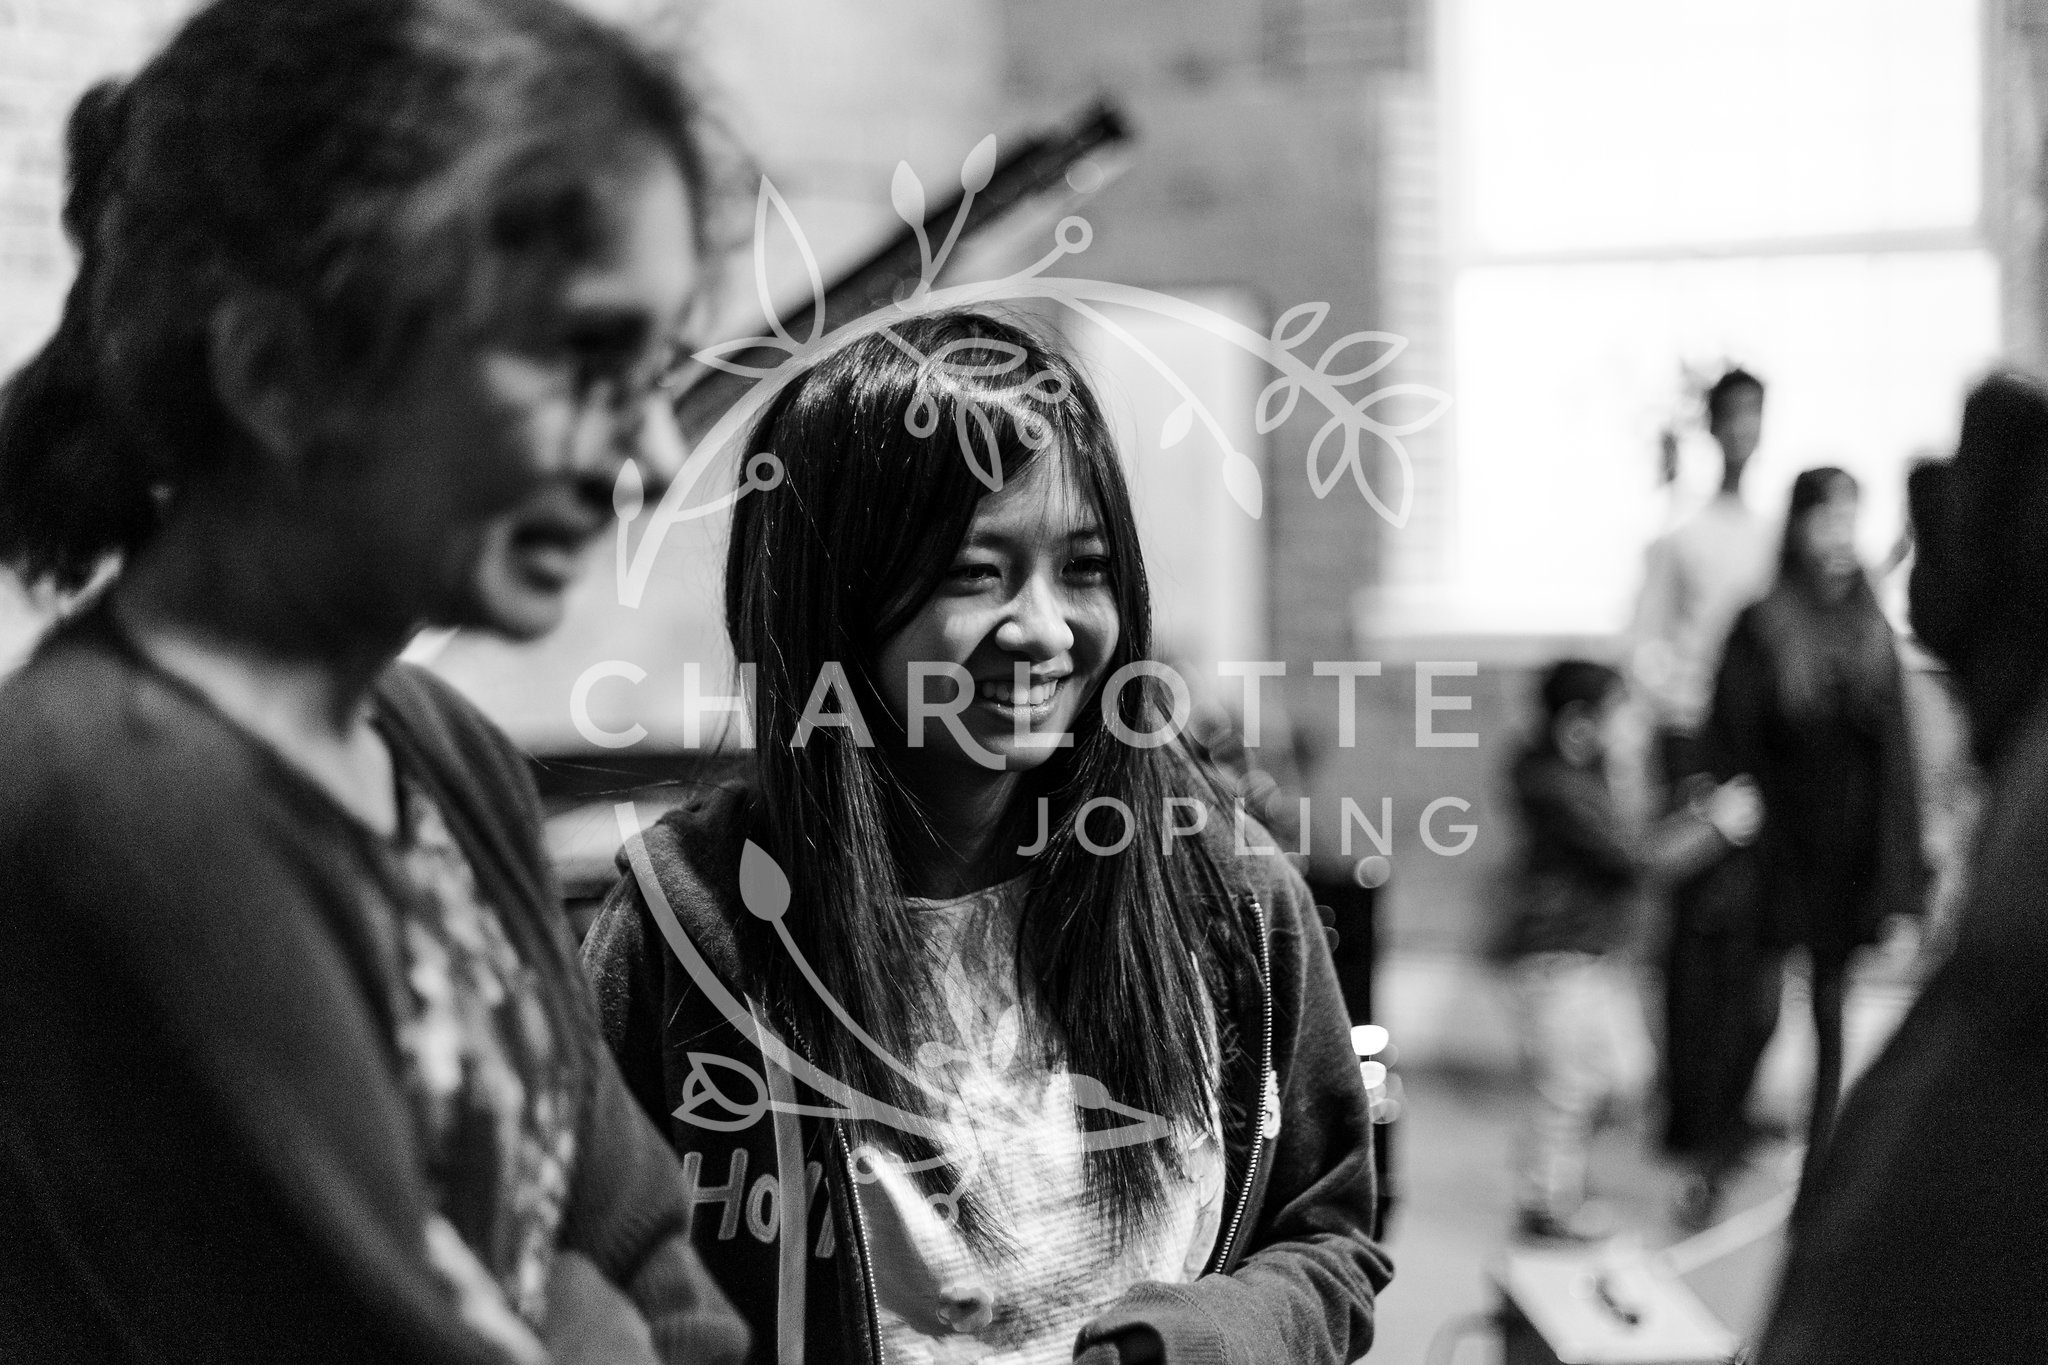 Stepping-Stones-Voicebox-Concert-2018-by-Charlotte-Jopling-45.jpg